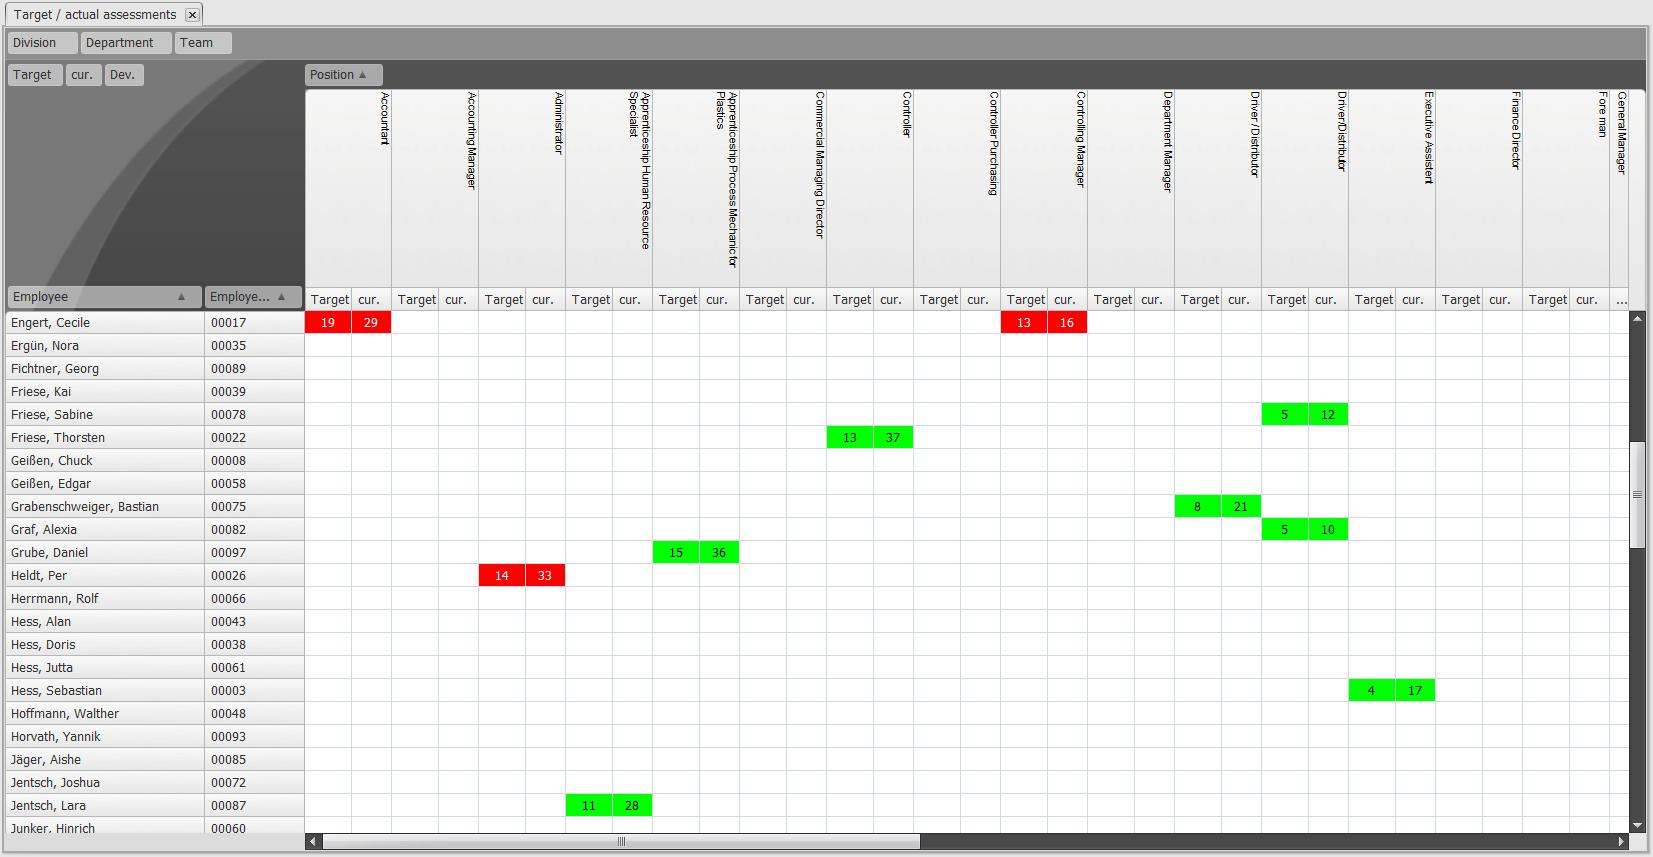 Target / Actual Assessments